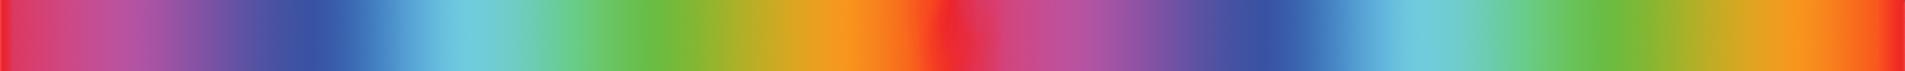 rainbow-divider.png